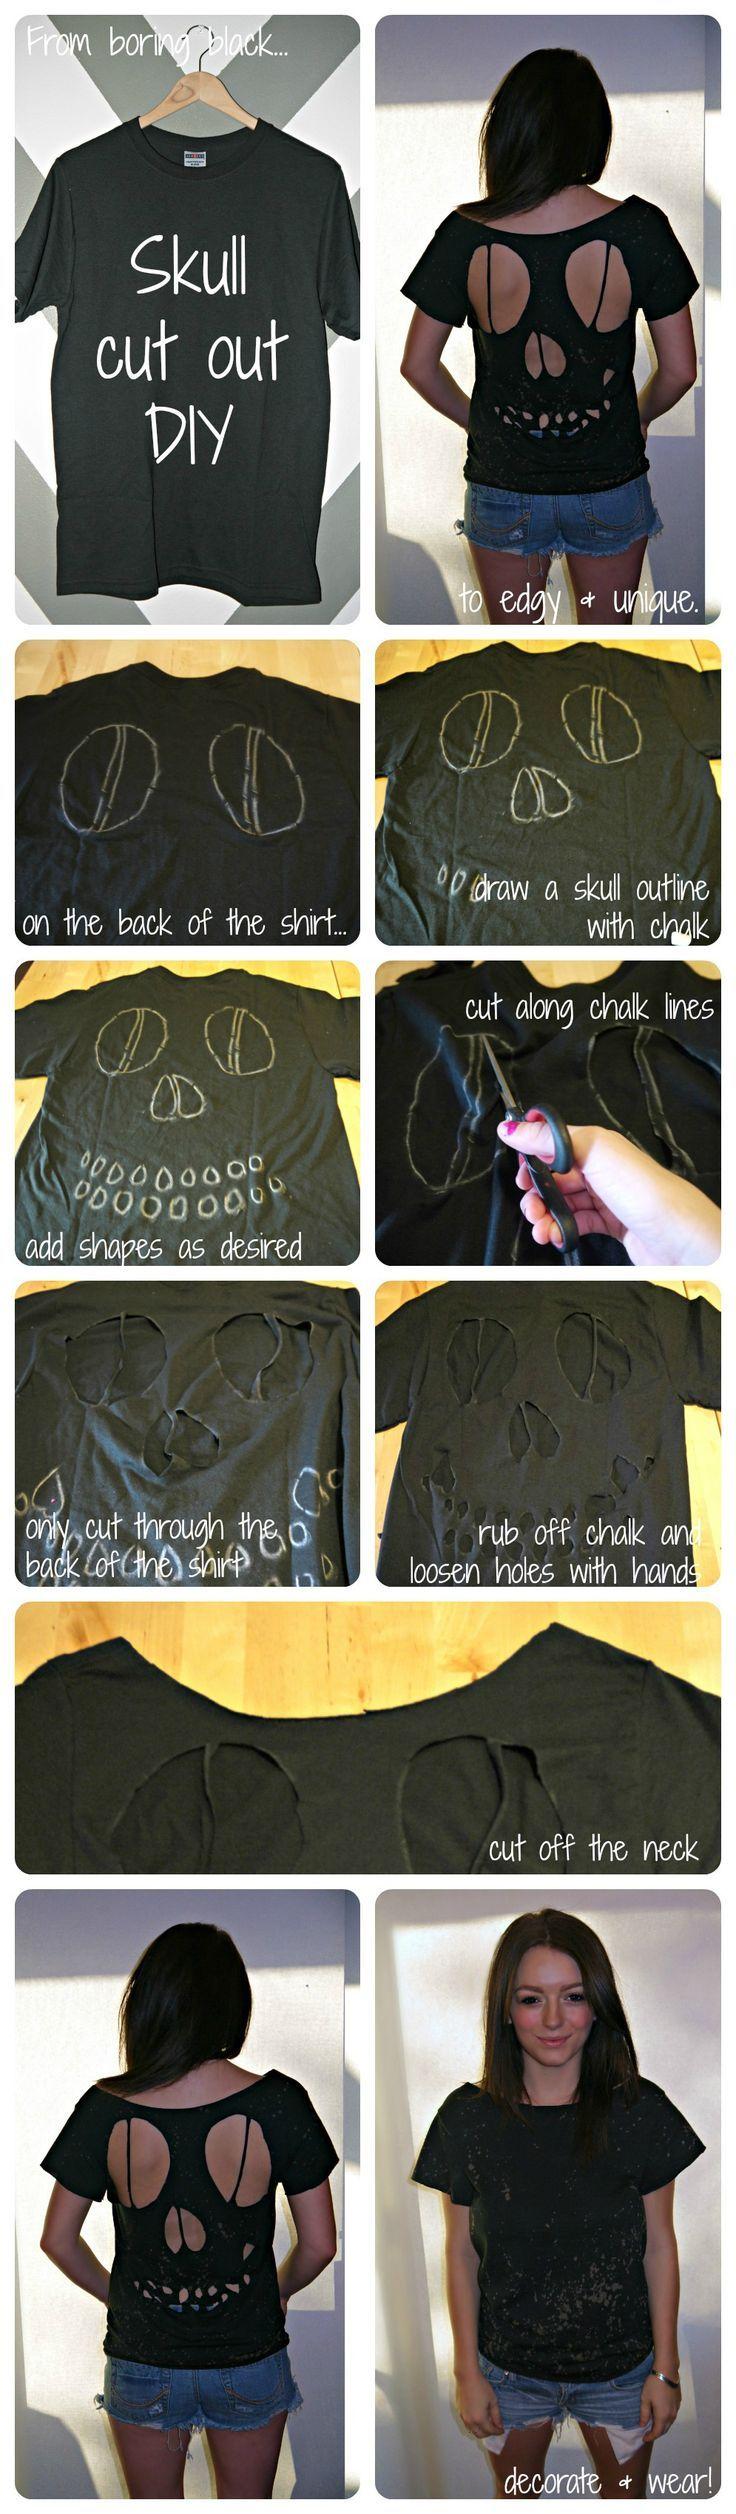 skull shirt! instead do a white shirt with a black undershirt